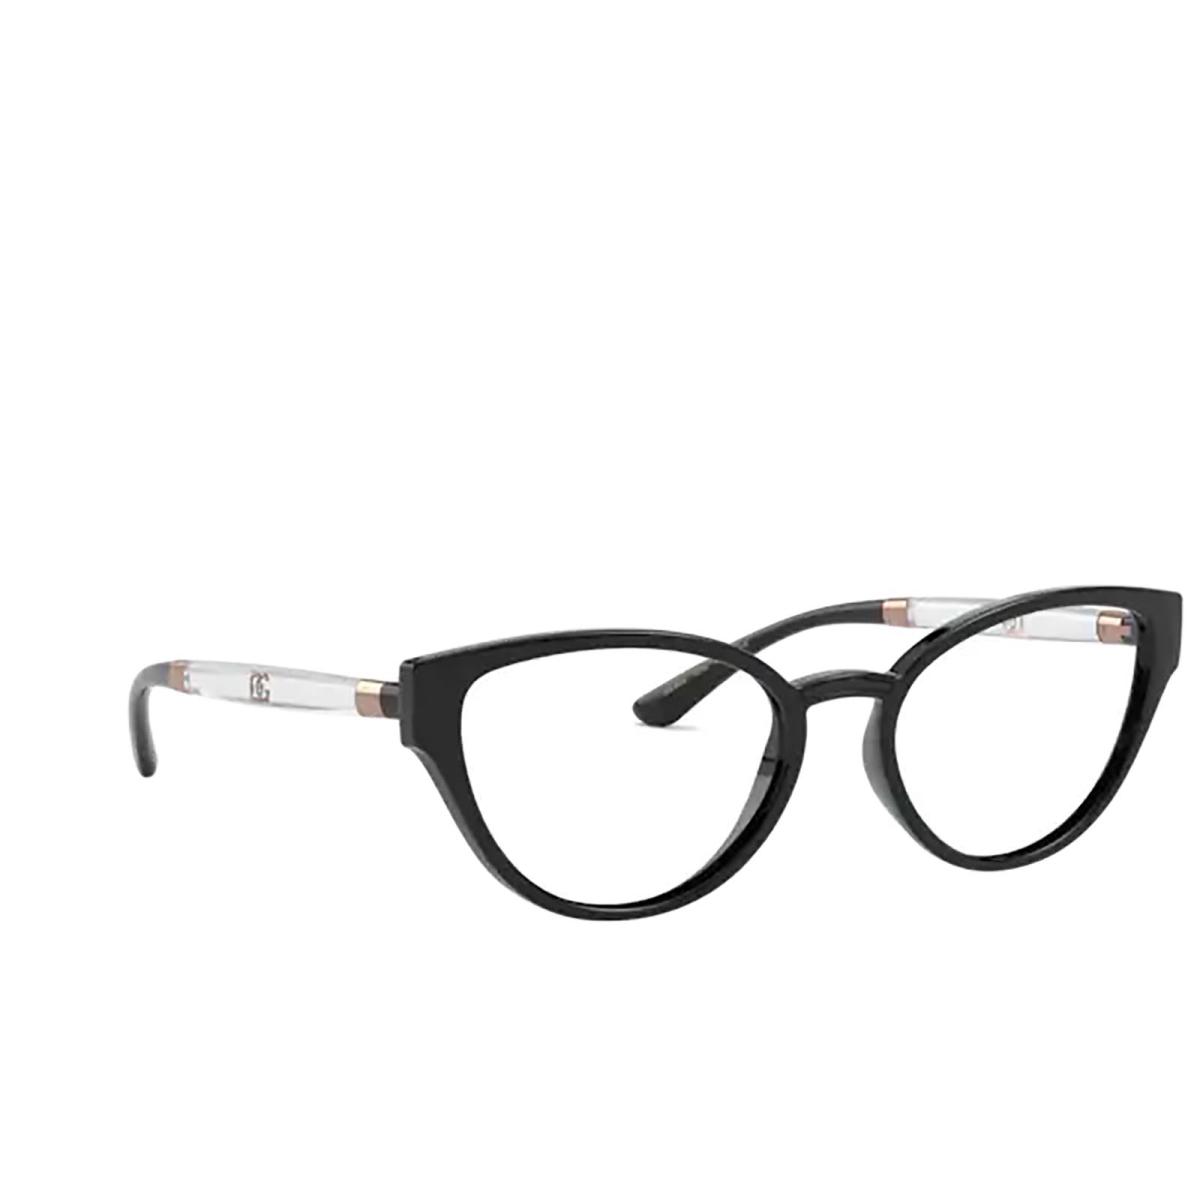 Dolce & Gabbana® Cat-eye Eyeglasses: DG5055 color Black 5012.